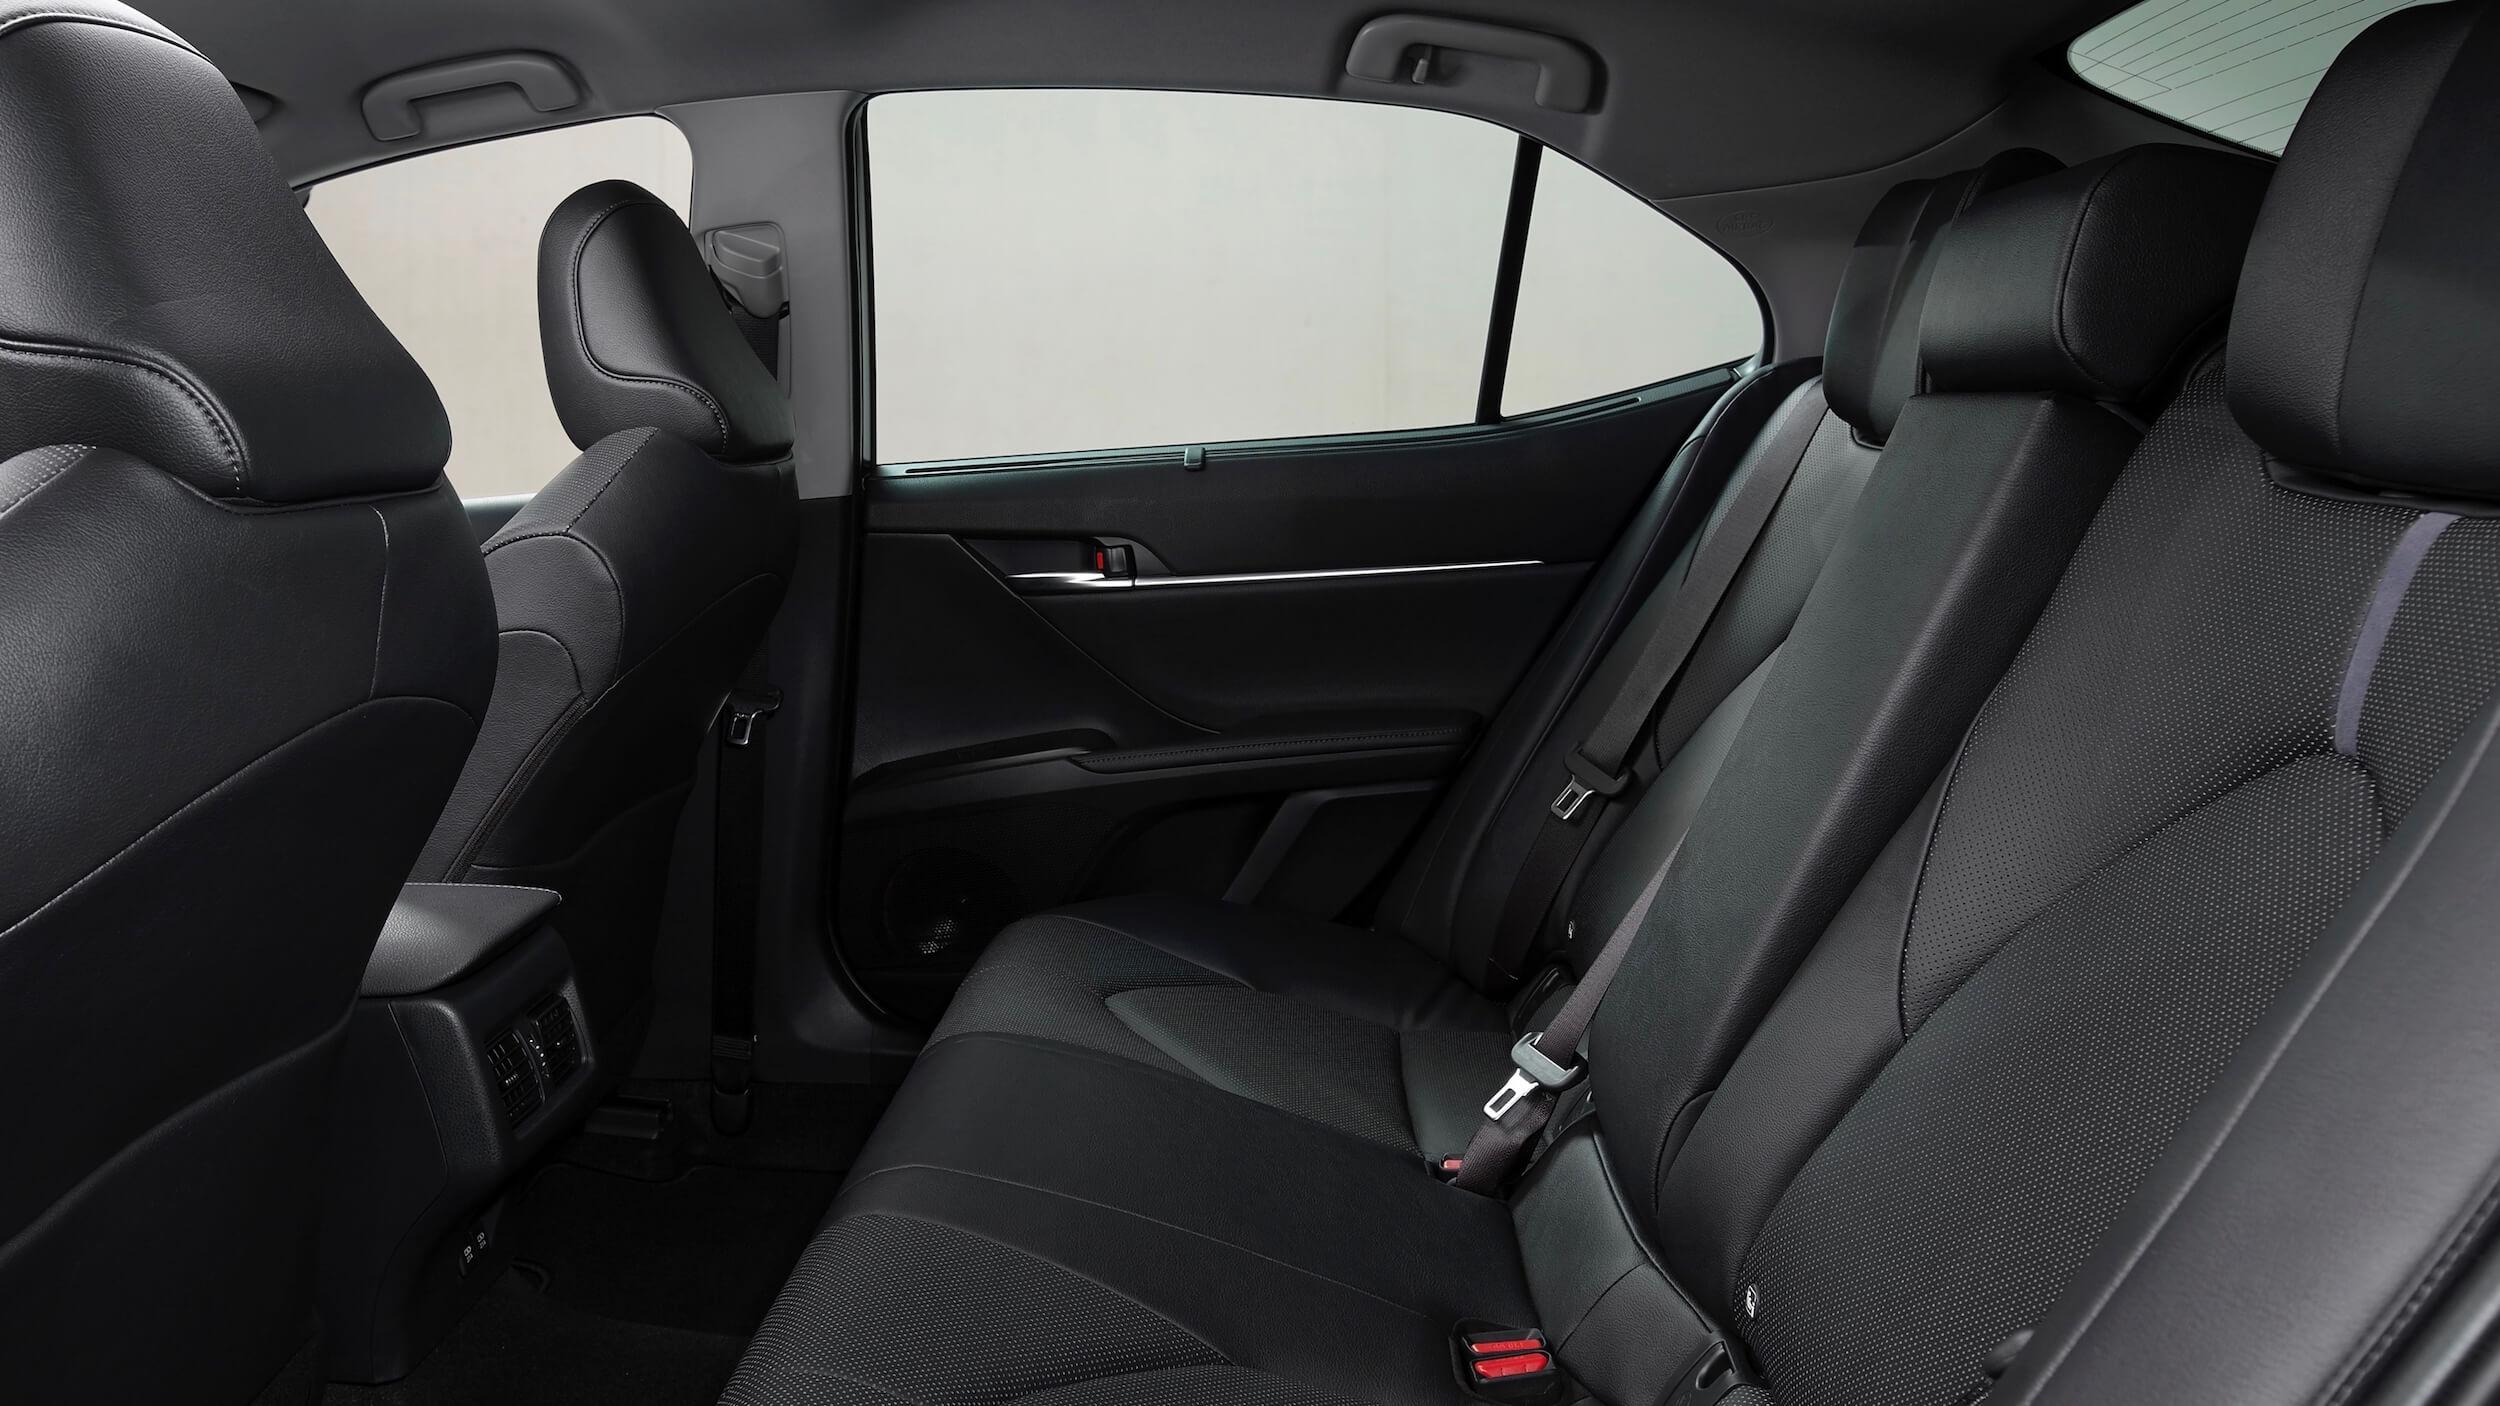 Toyota Camry Hybrid 2021 bancos traseiros